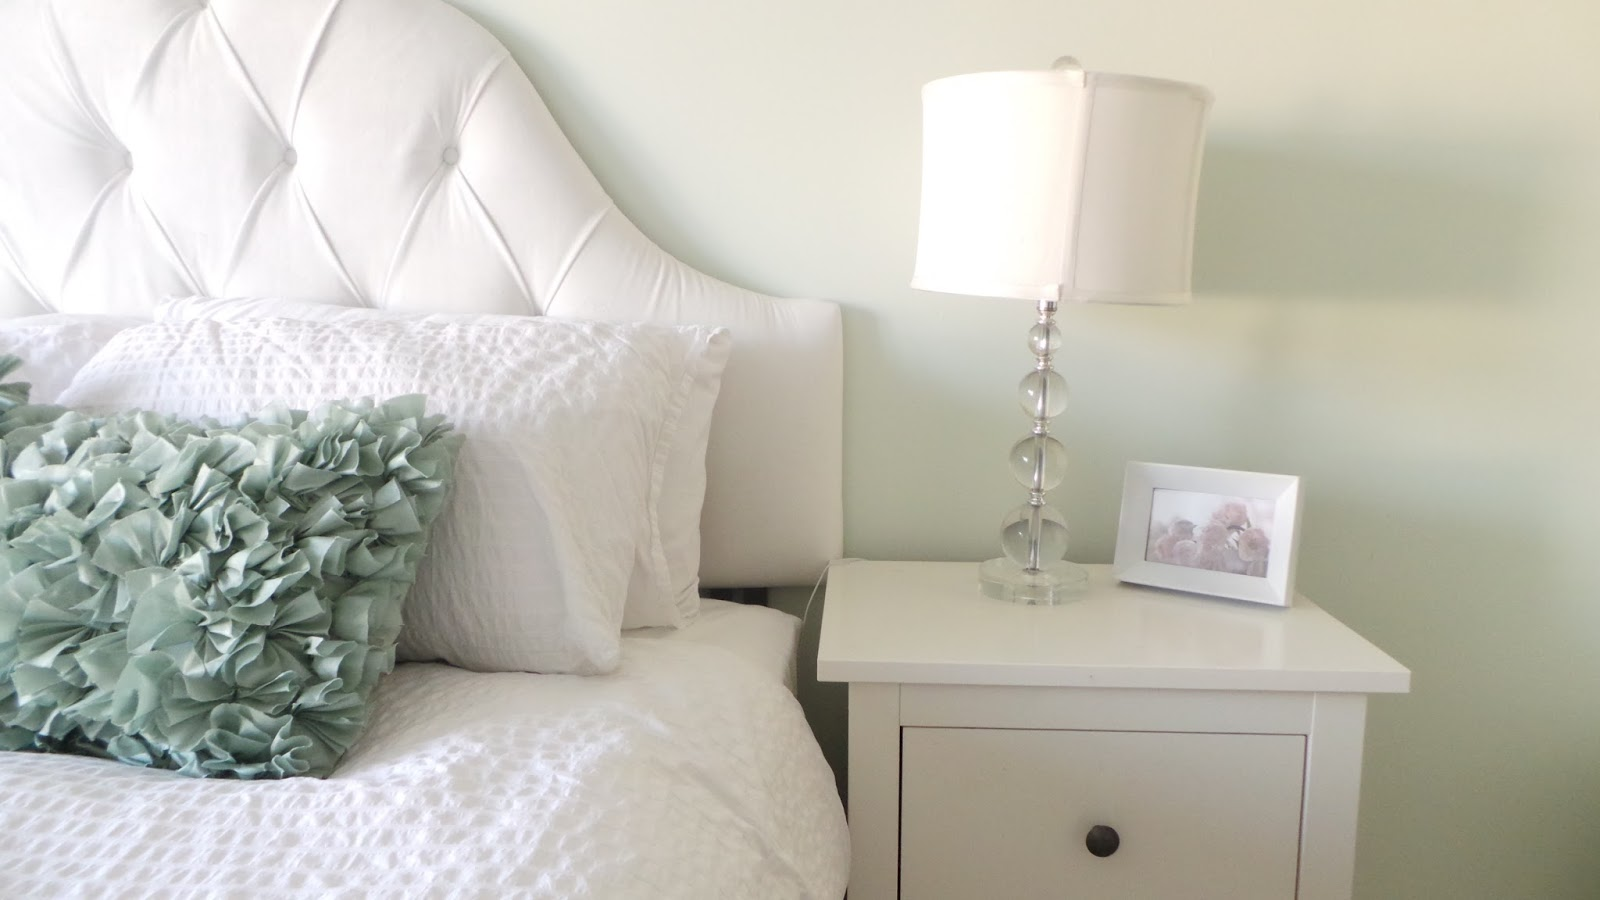 White House Master Bedroom 2015 fortunate house: master bedroom